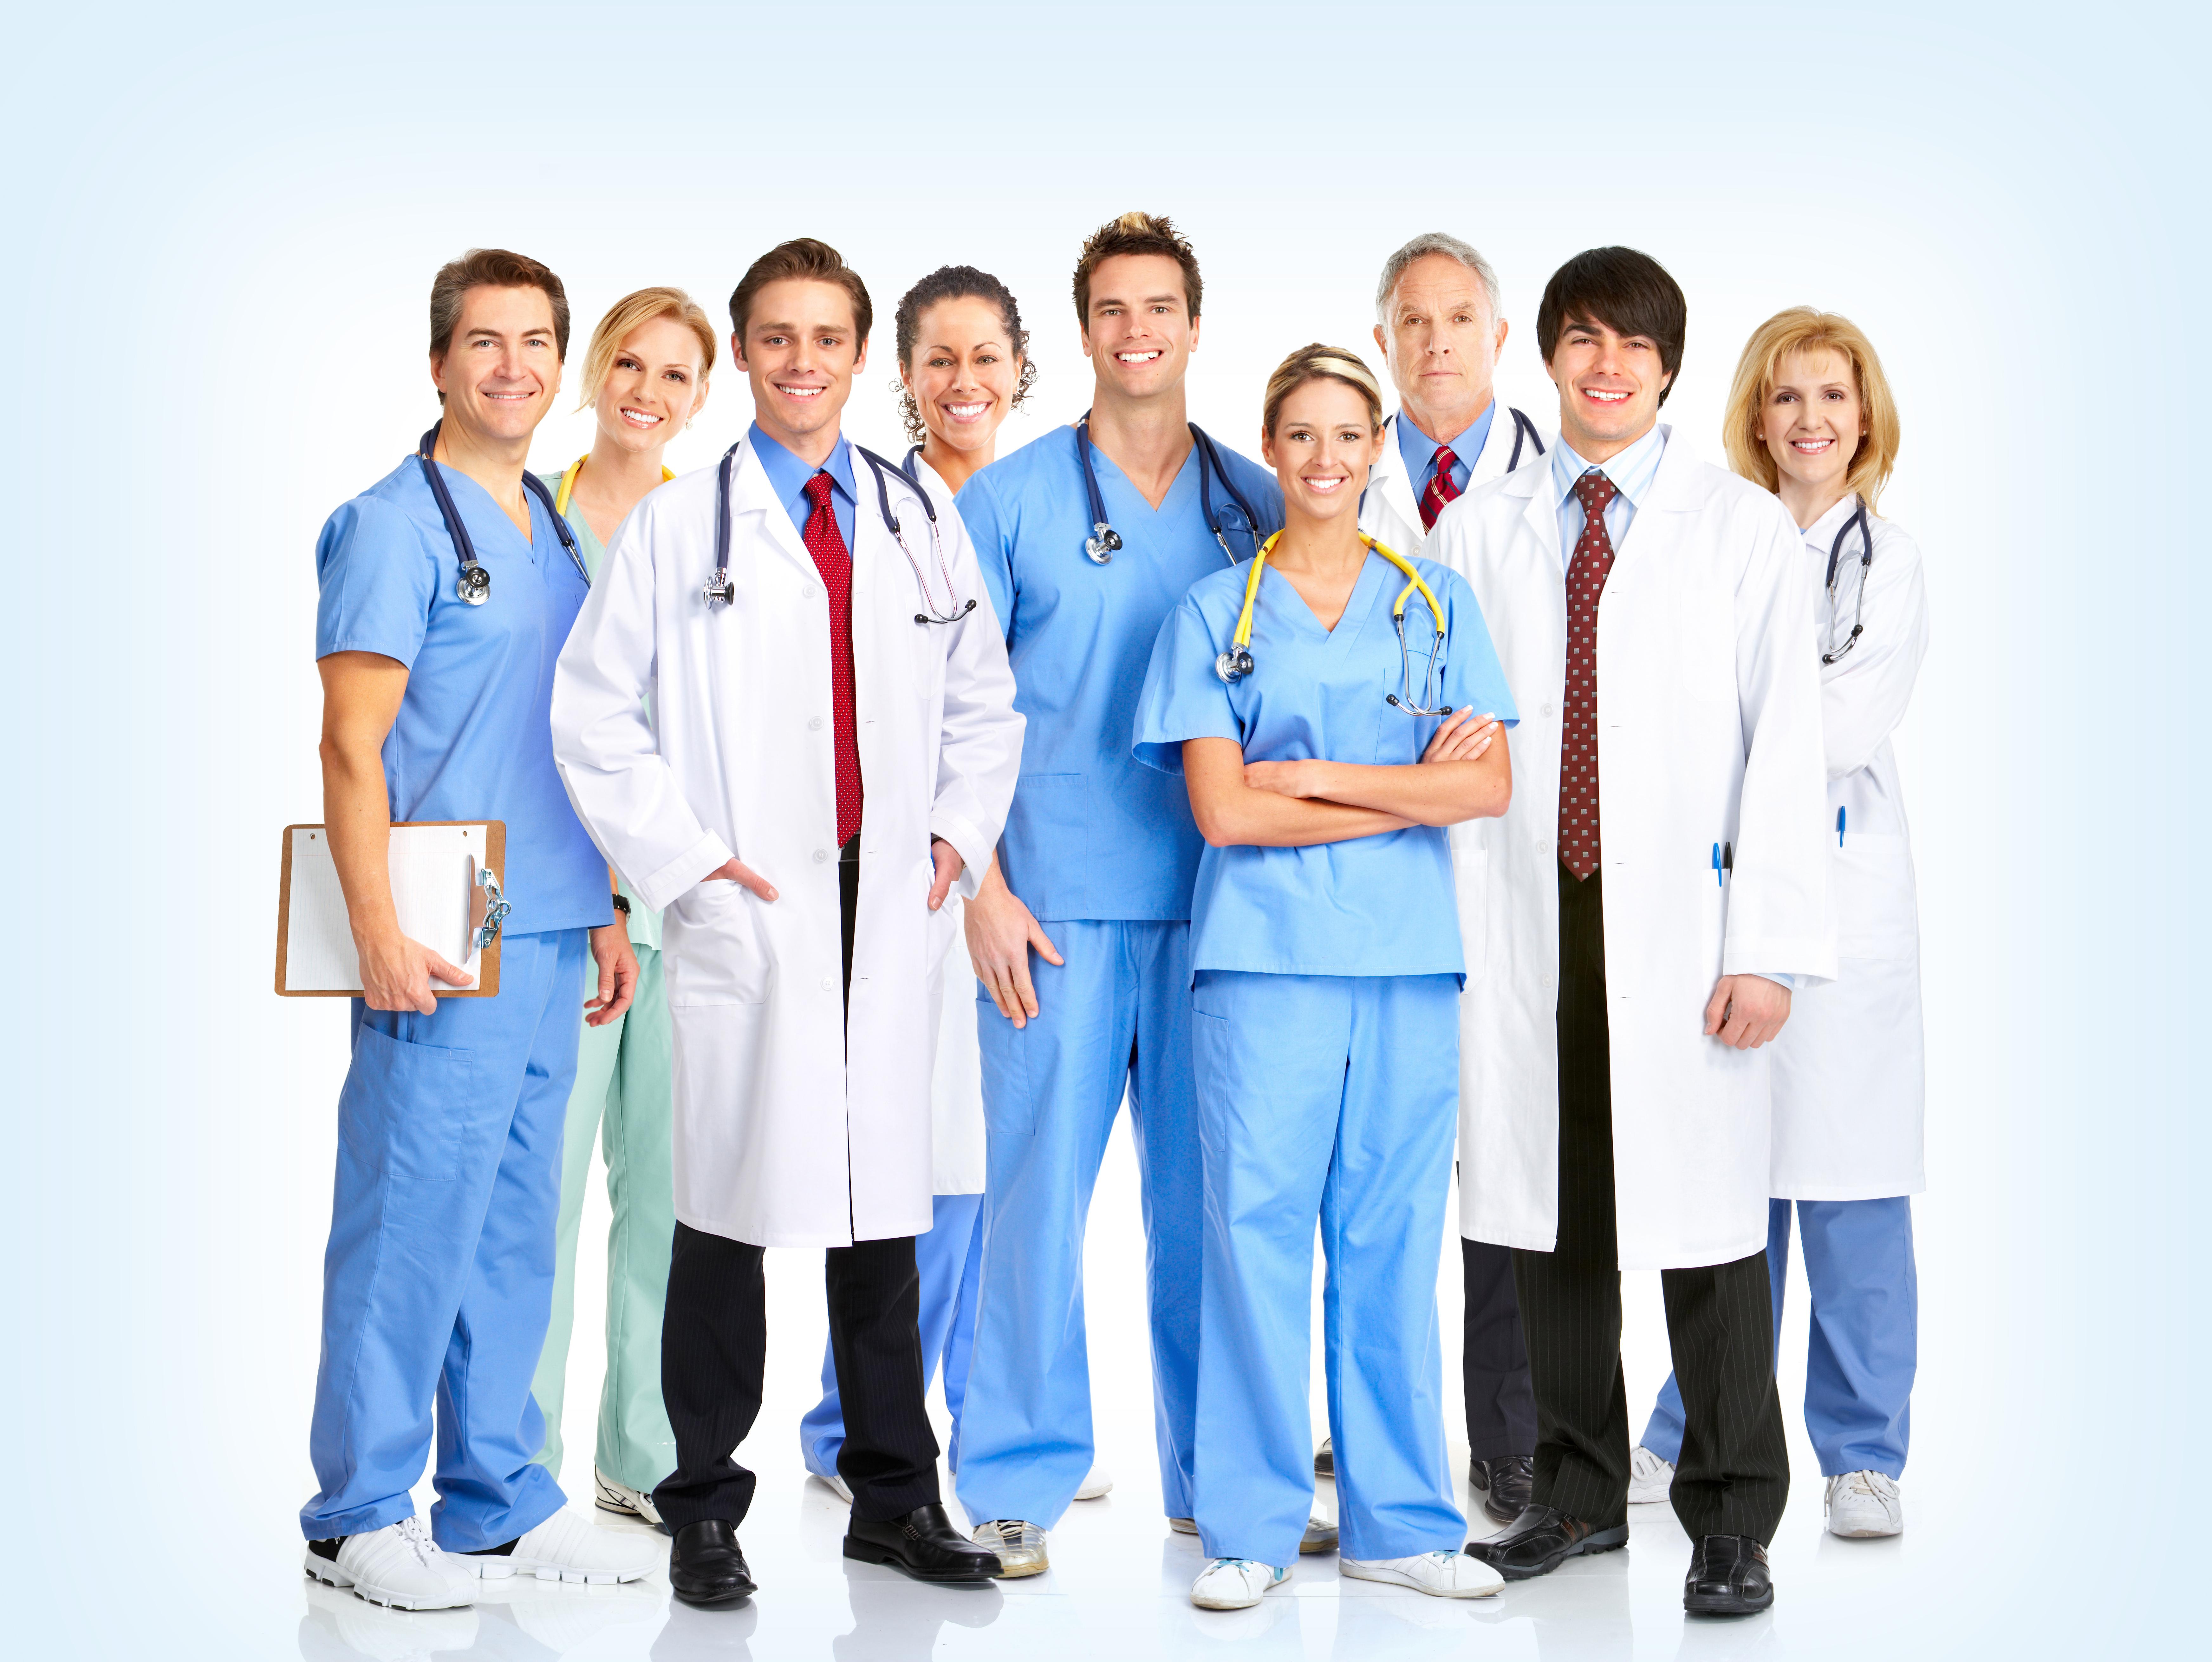 American nurse dating site